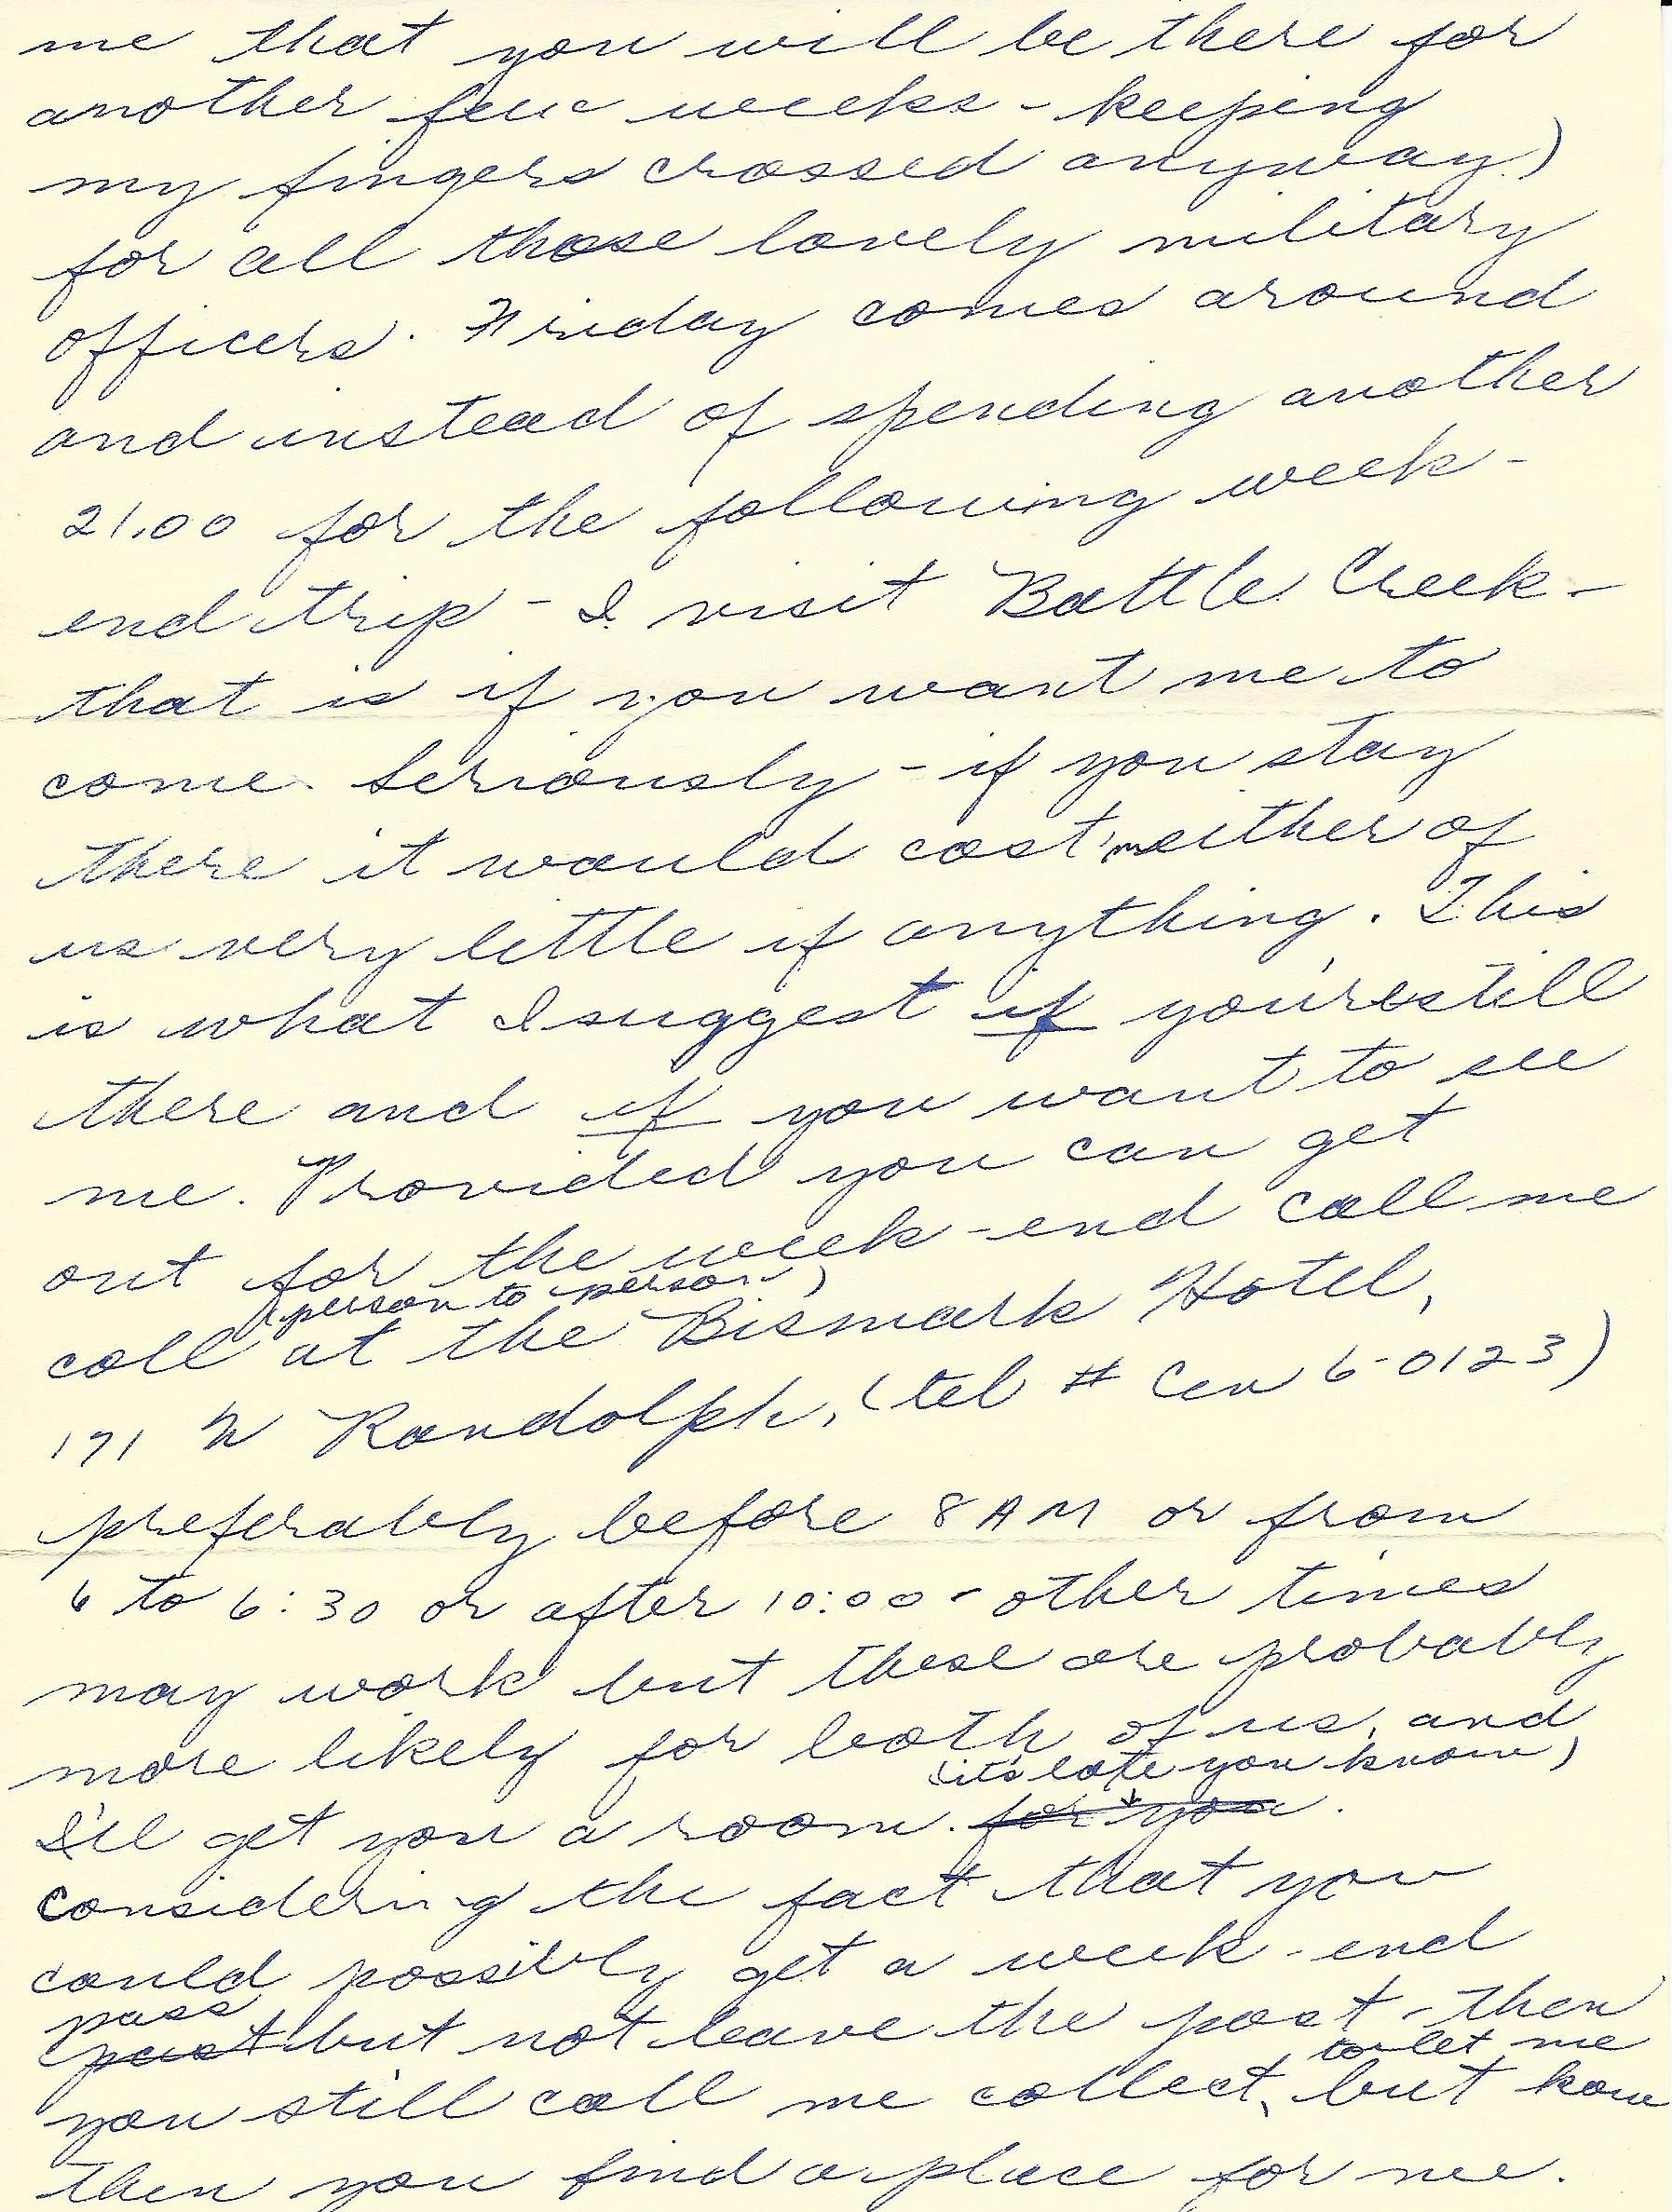 2. Oct. 3, 1952 (Oma)_Page_3.jpg